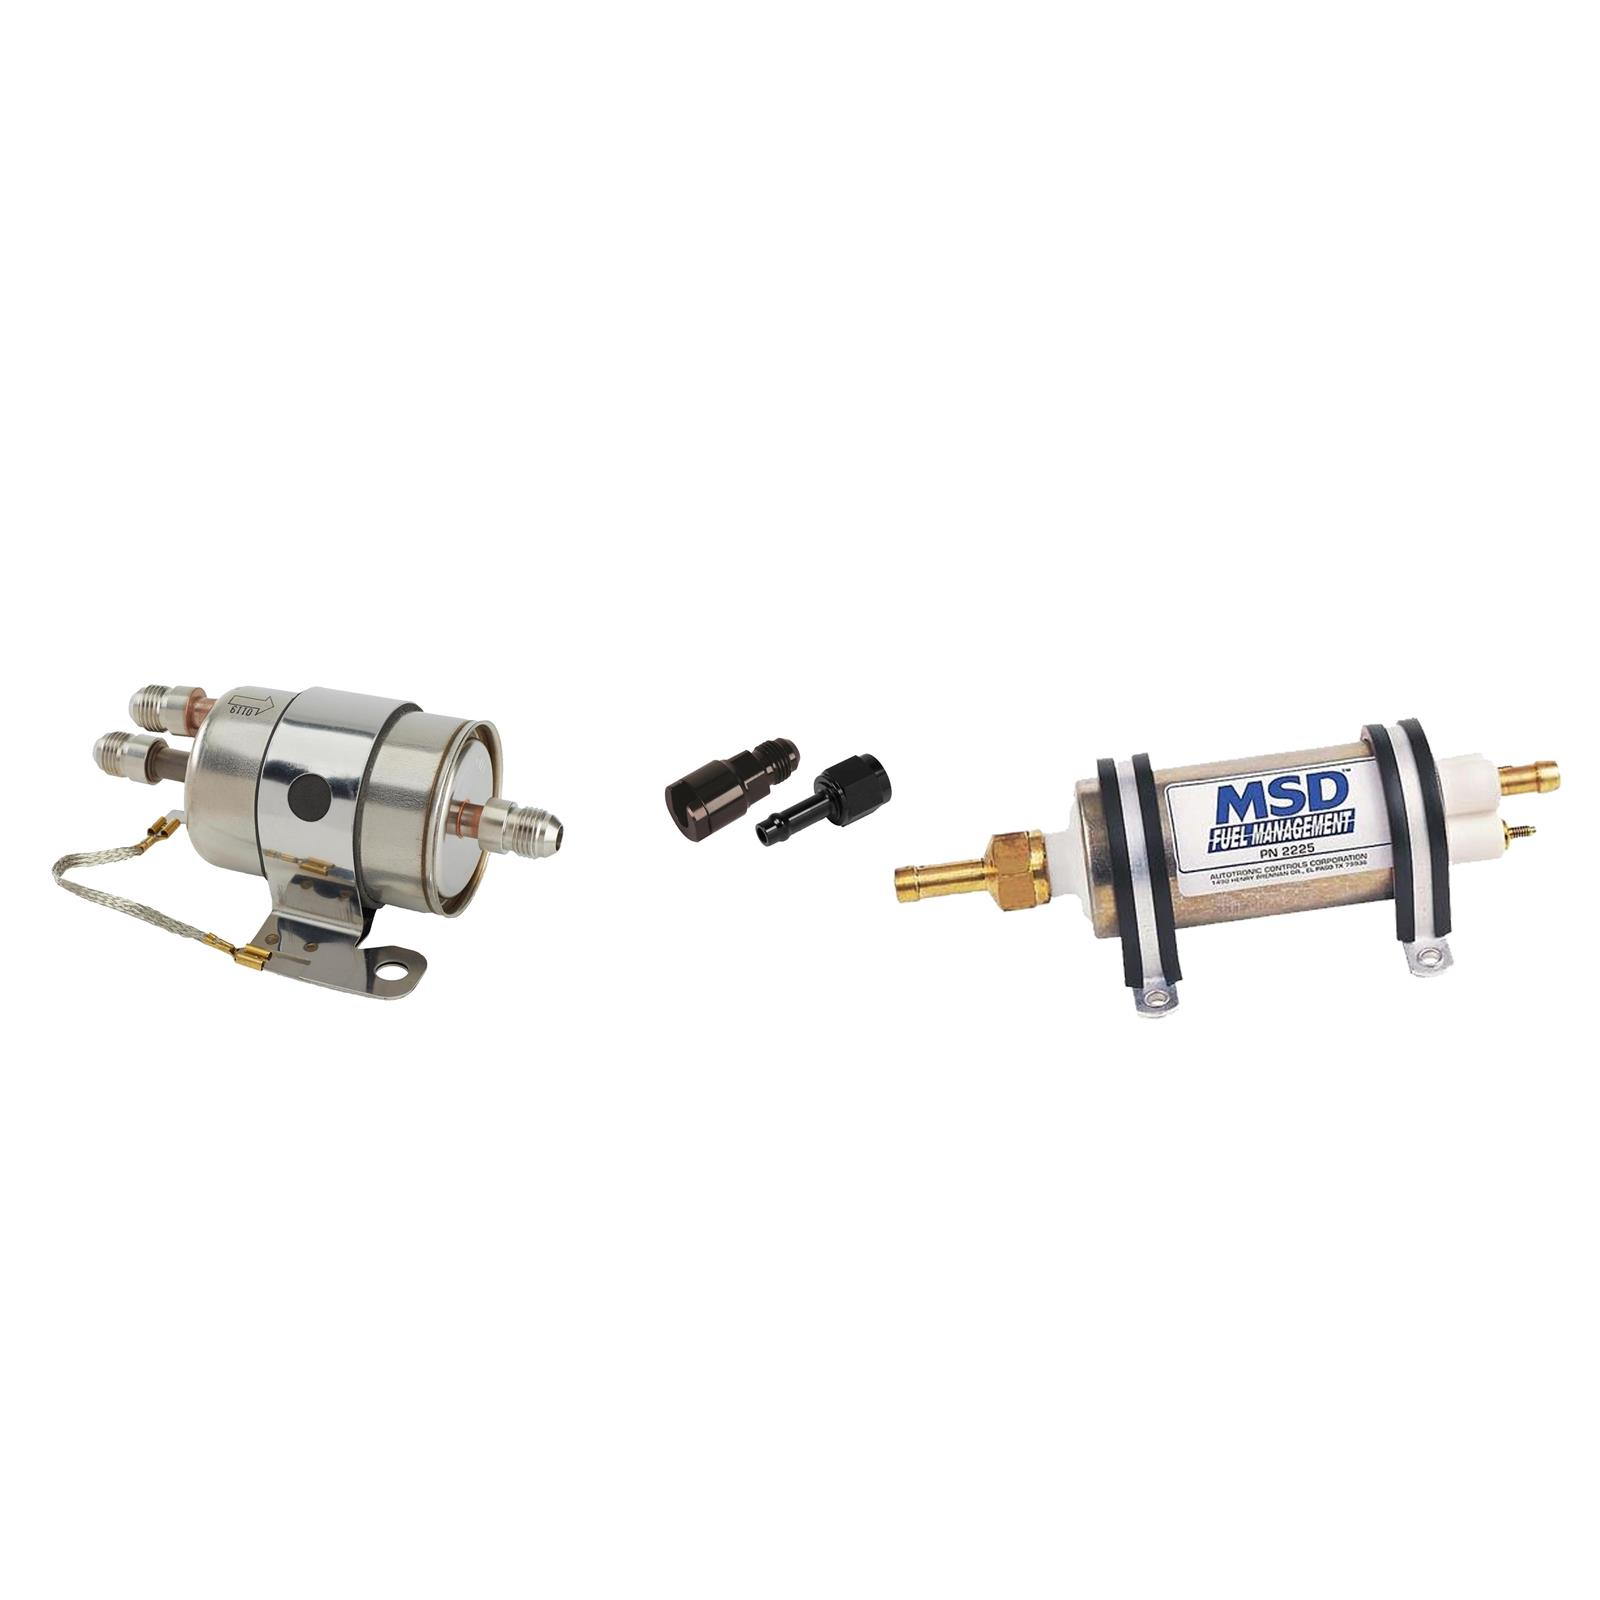 Push Lock Hose Filter Fittings Kit Gm Ls Engine Fuel Line